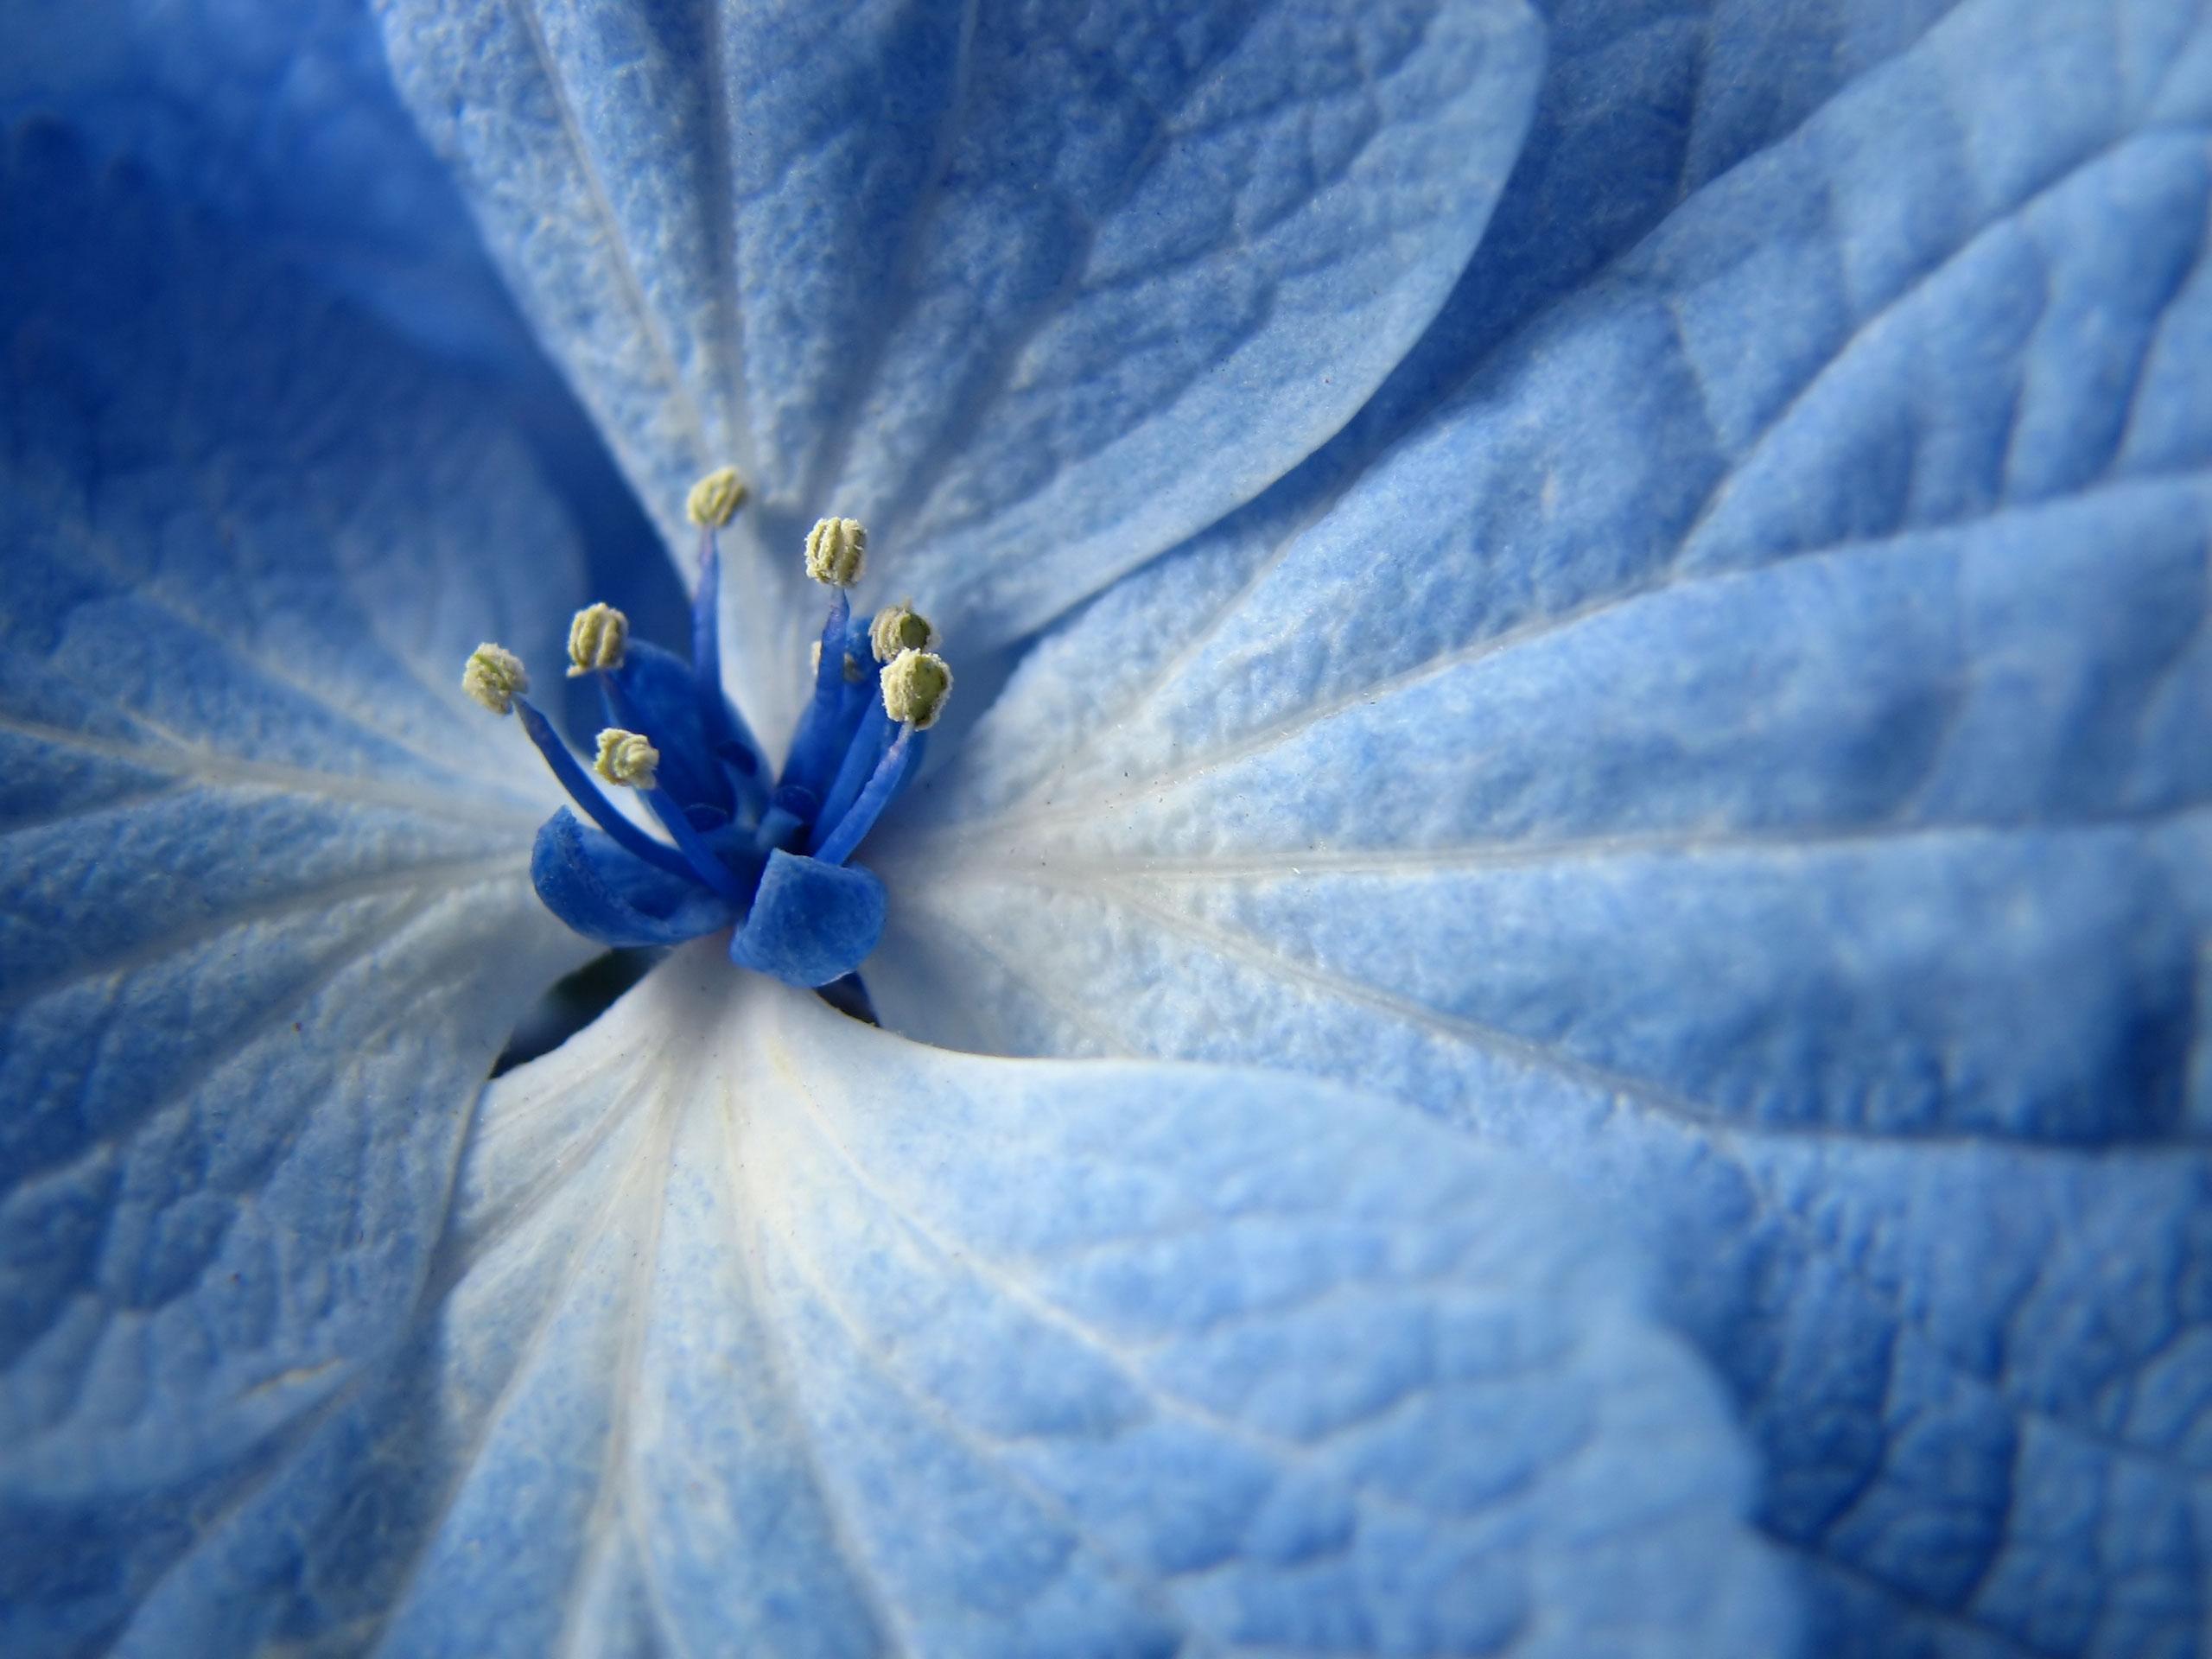 Blue Flower Wallpapers HD Wallpapers 2560x1920